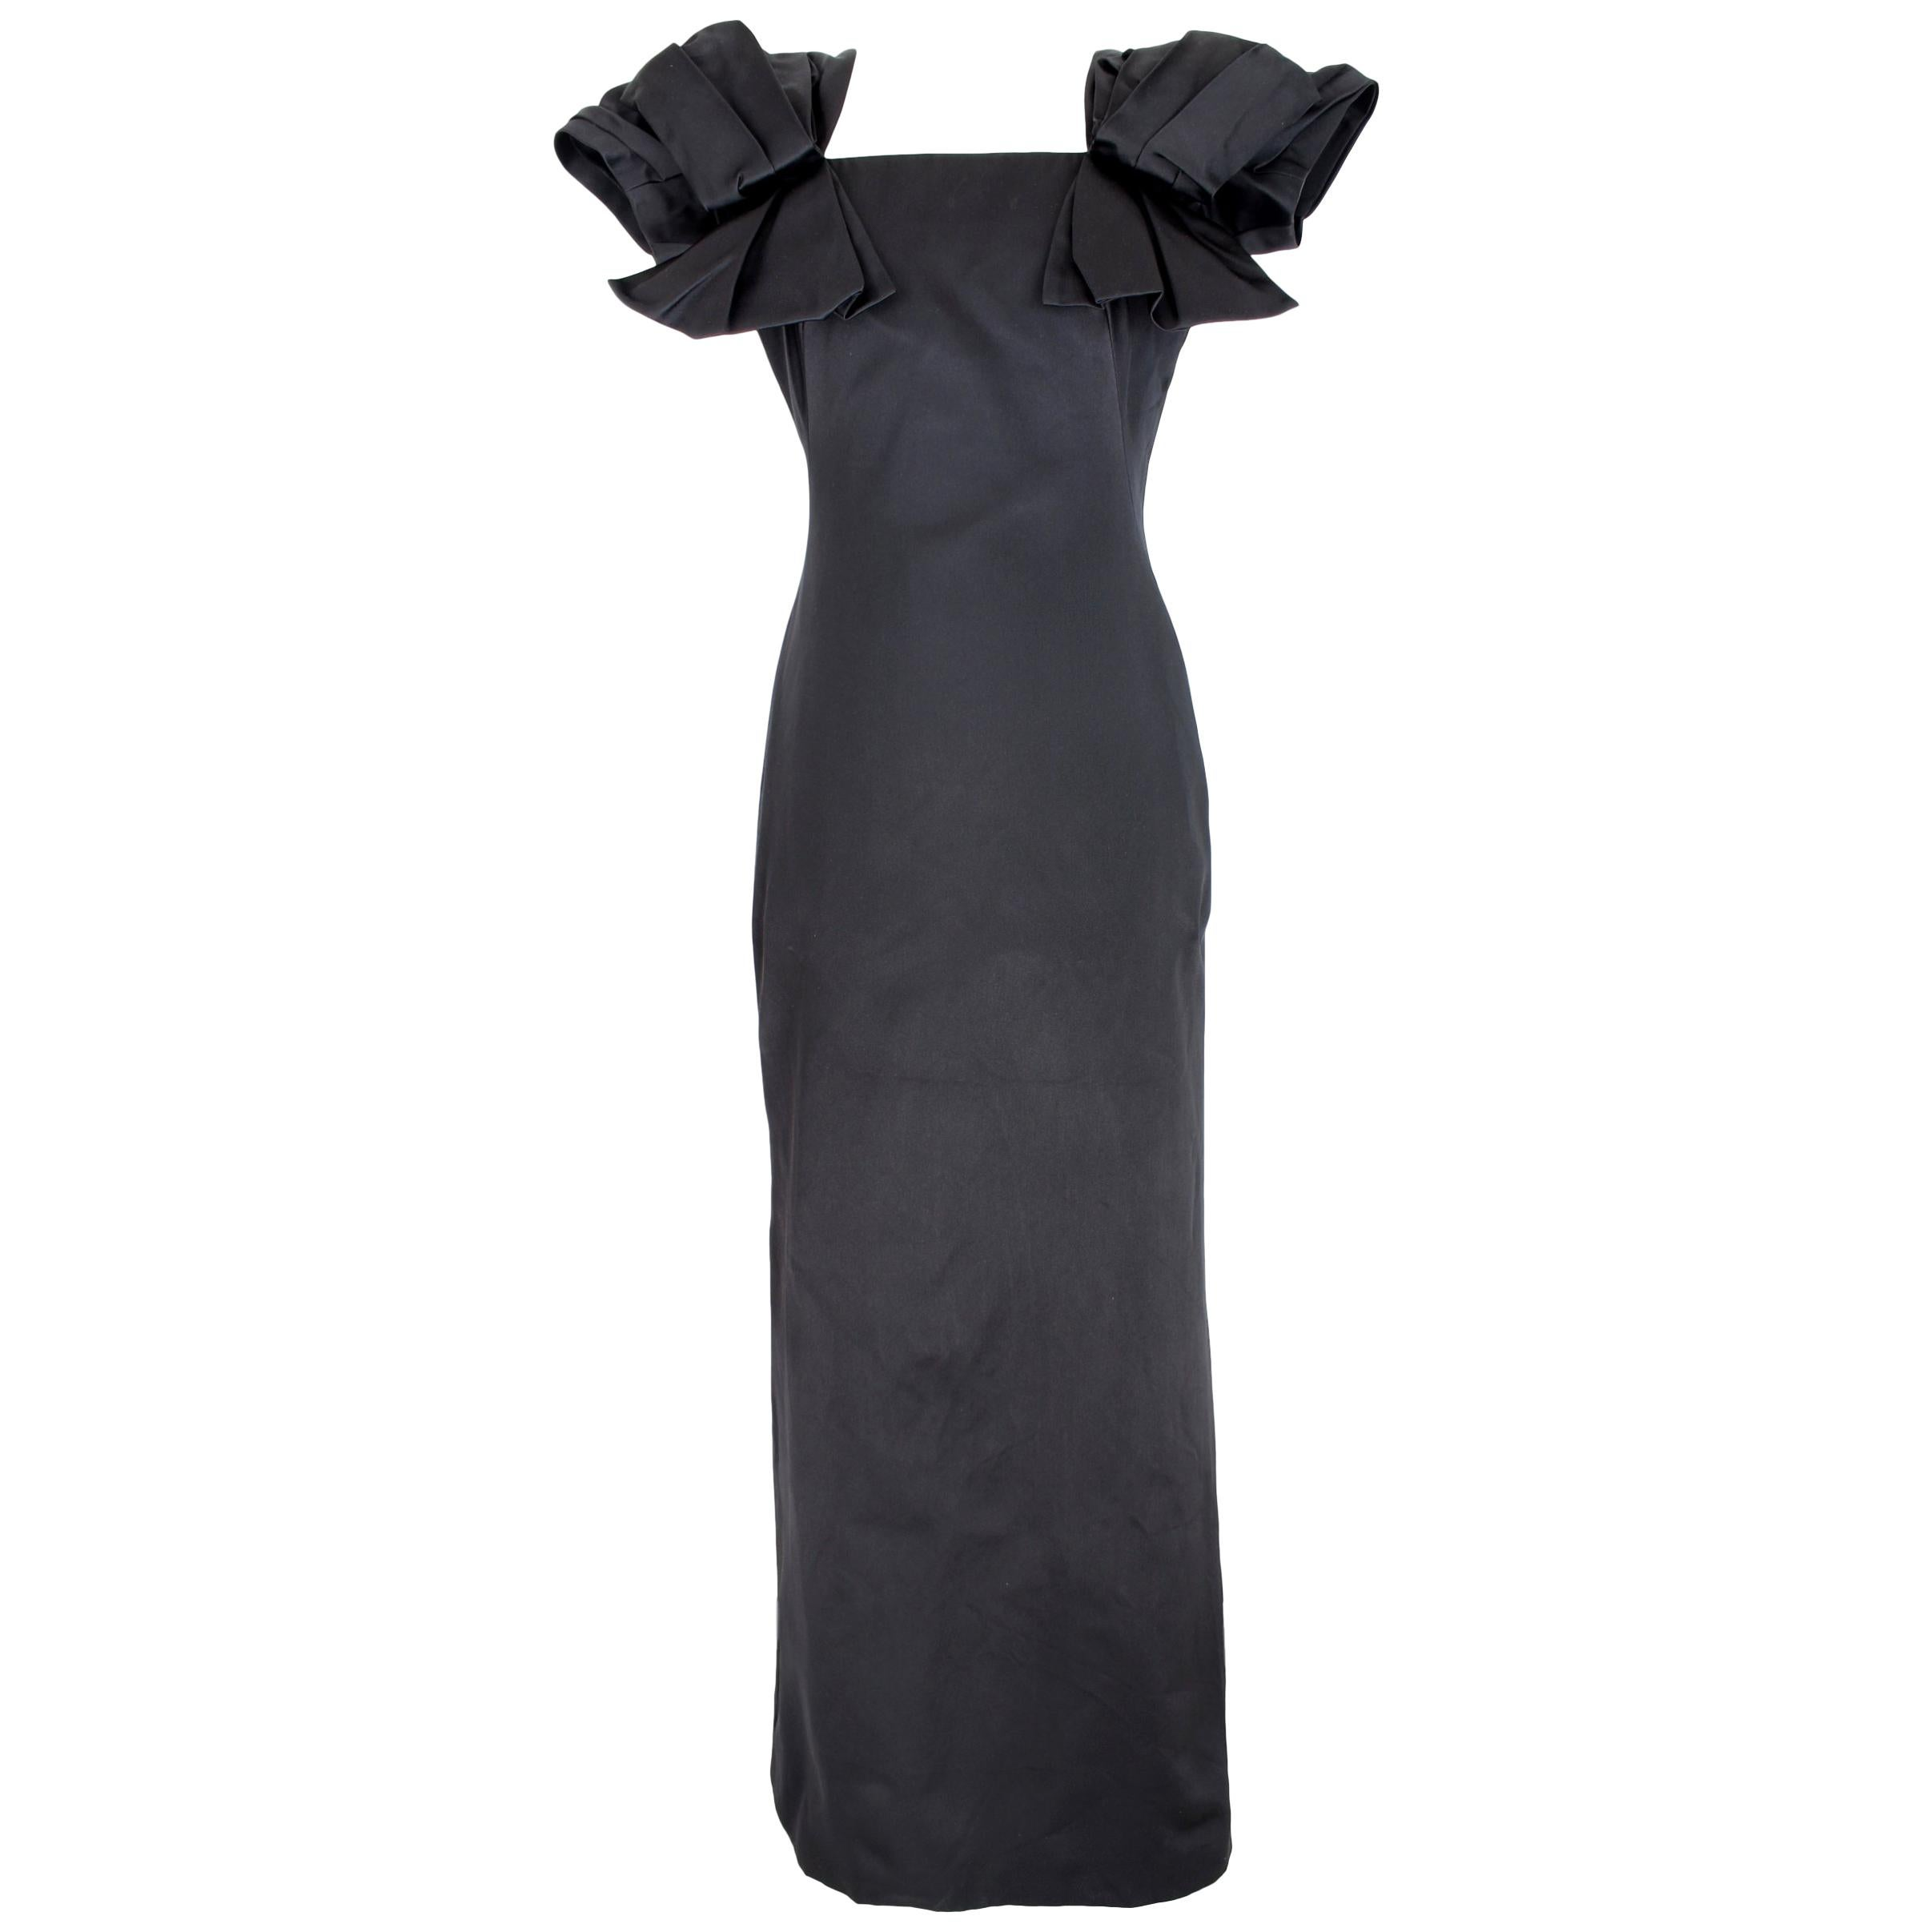 e1030ddc3b Silk Black Dresses - 3532 For Sale on 1stdibs